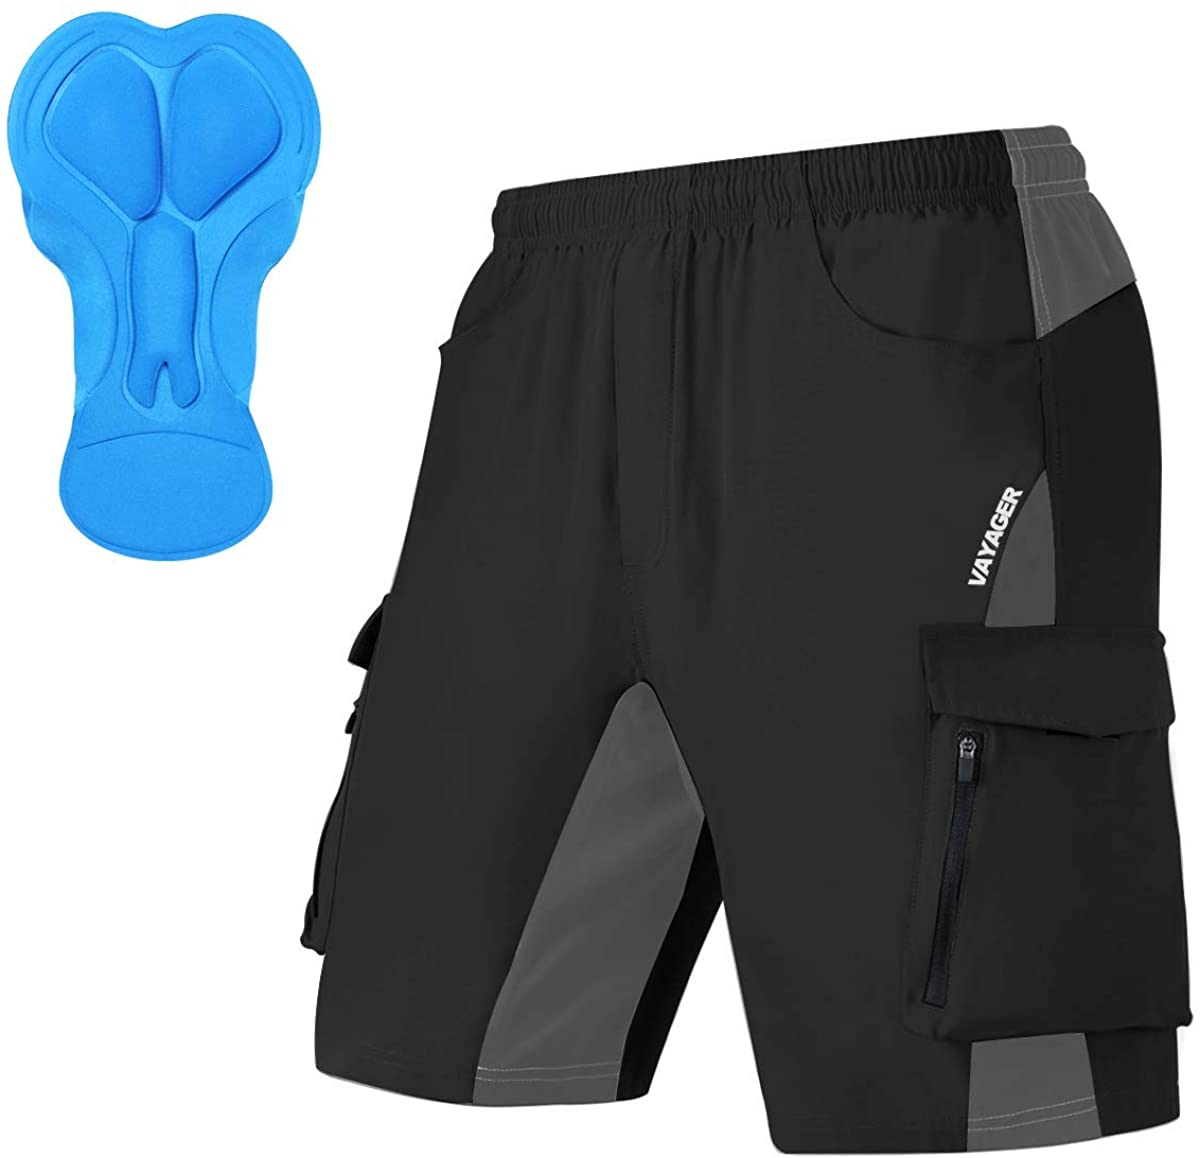 Men's Mountain Bike Shorts 3D Padded Bicycle MTB Shorts Loose-fit Lightweight MTB Cycling Shorts